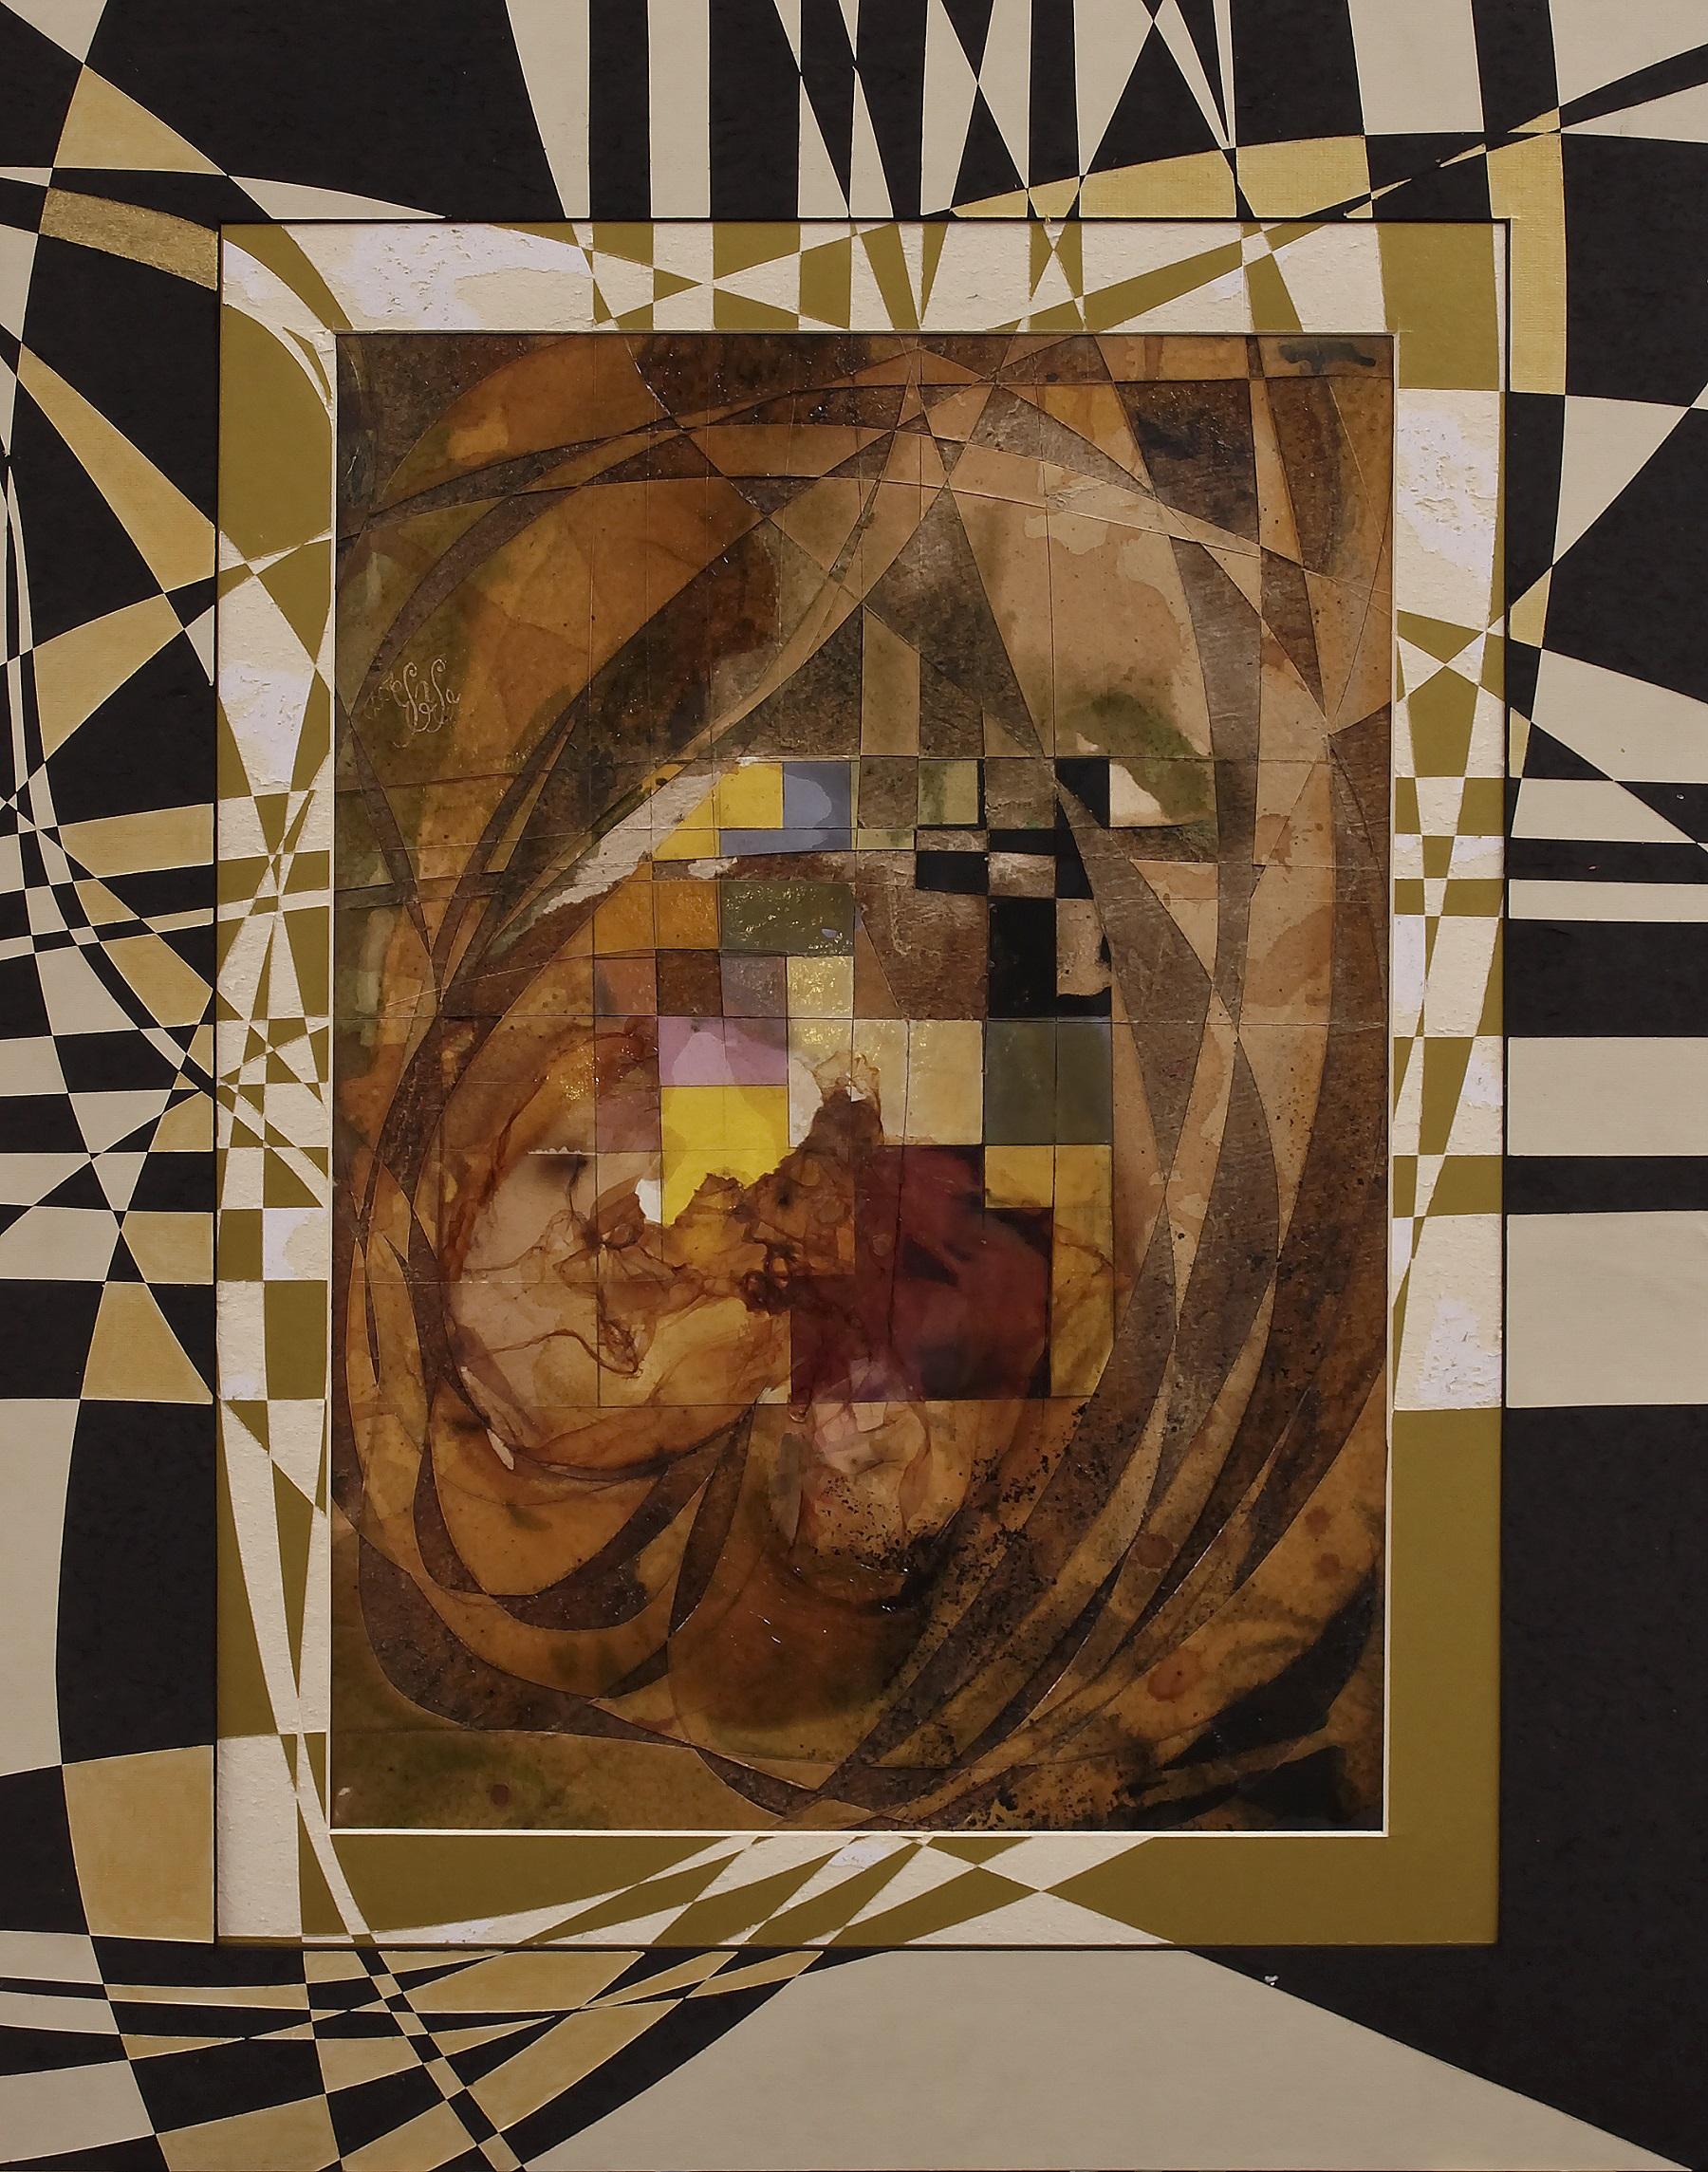 """Amber Heart"" Rumyanka Bozhkova Drawing Engraving on Multilayer Cardboard"